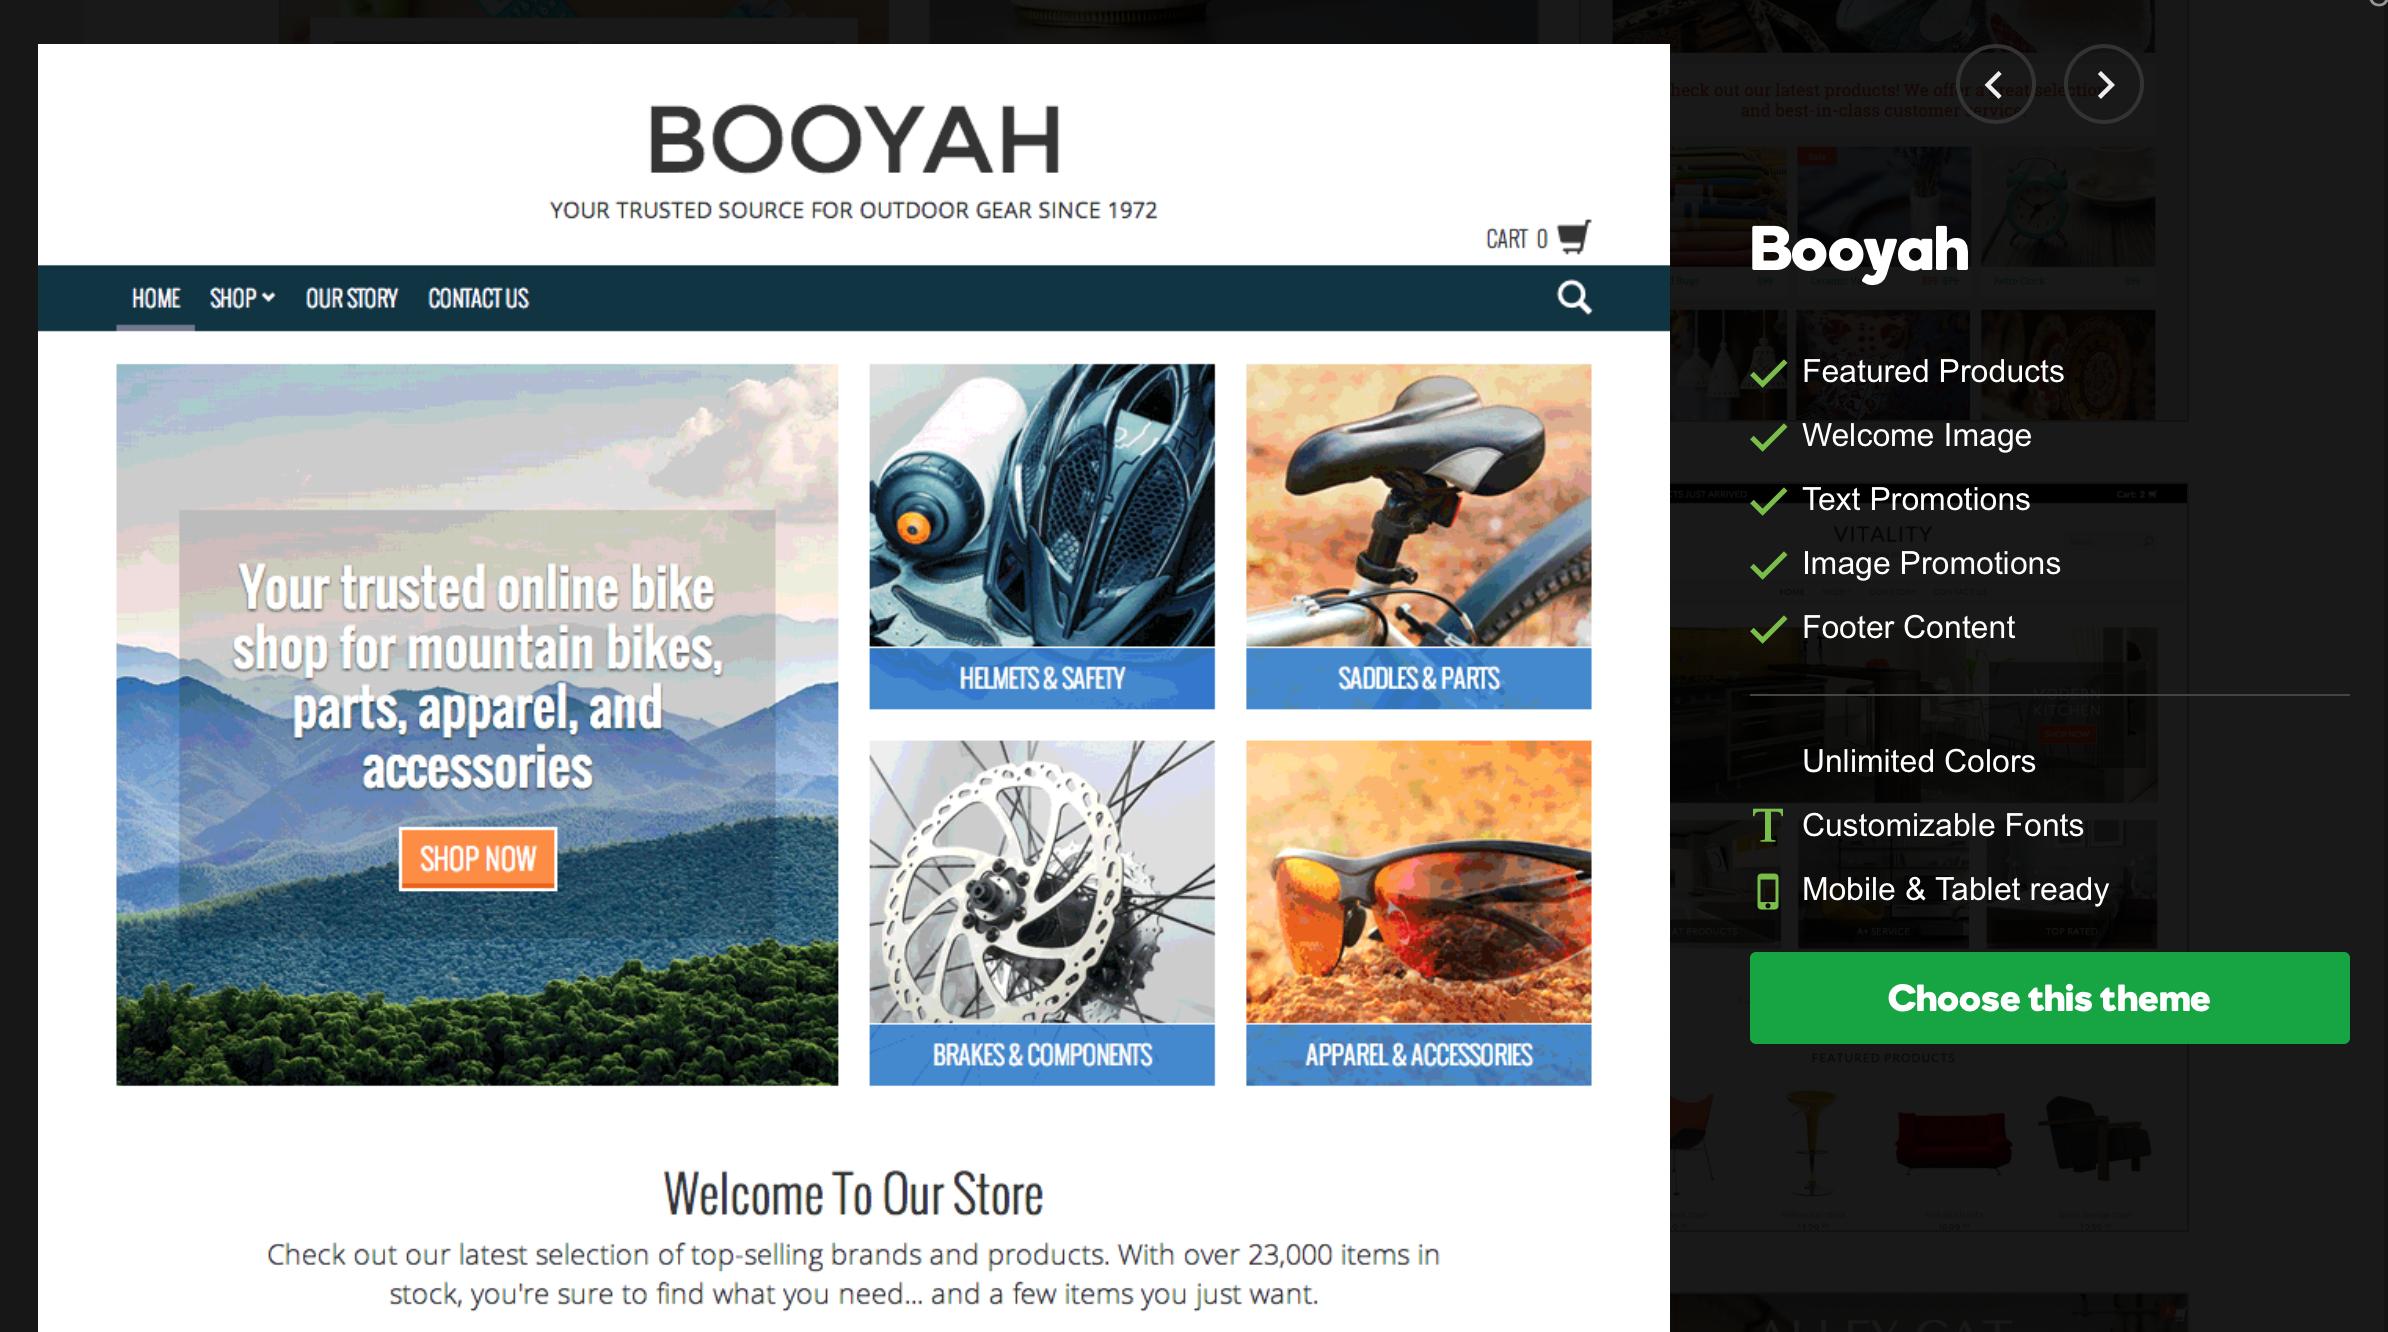 GoDaddy Online Store - Booyah Theme